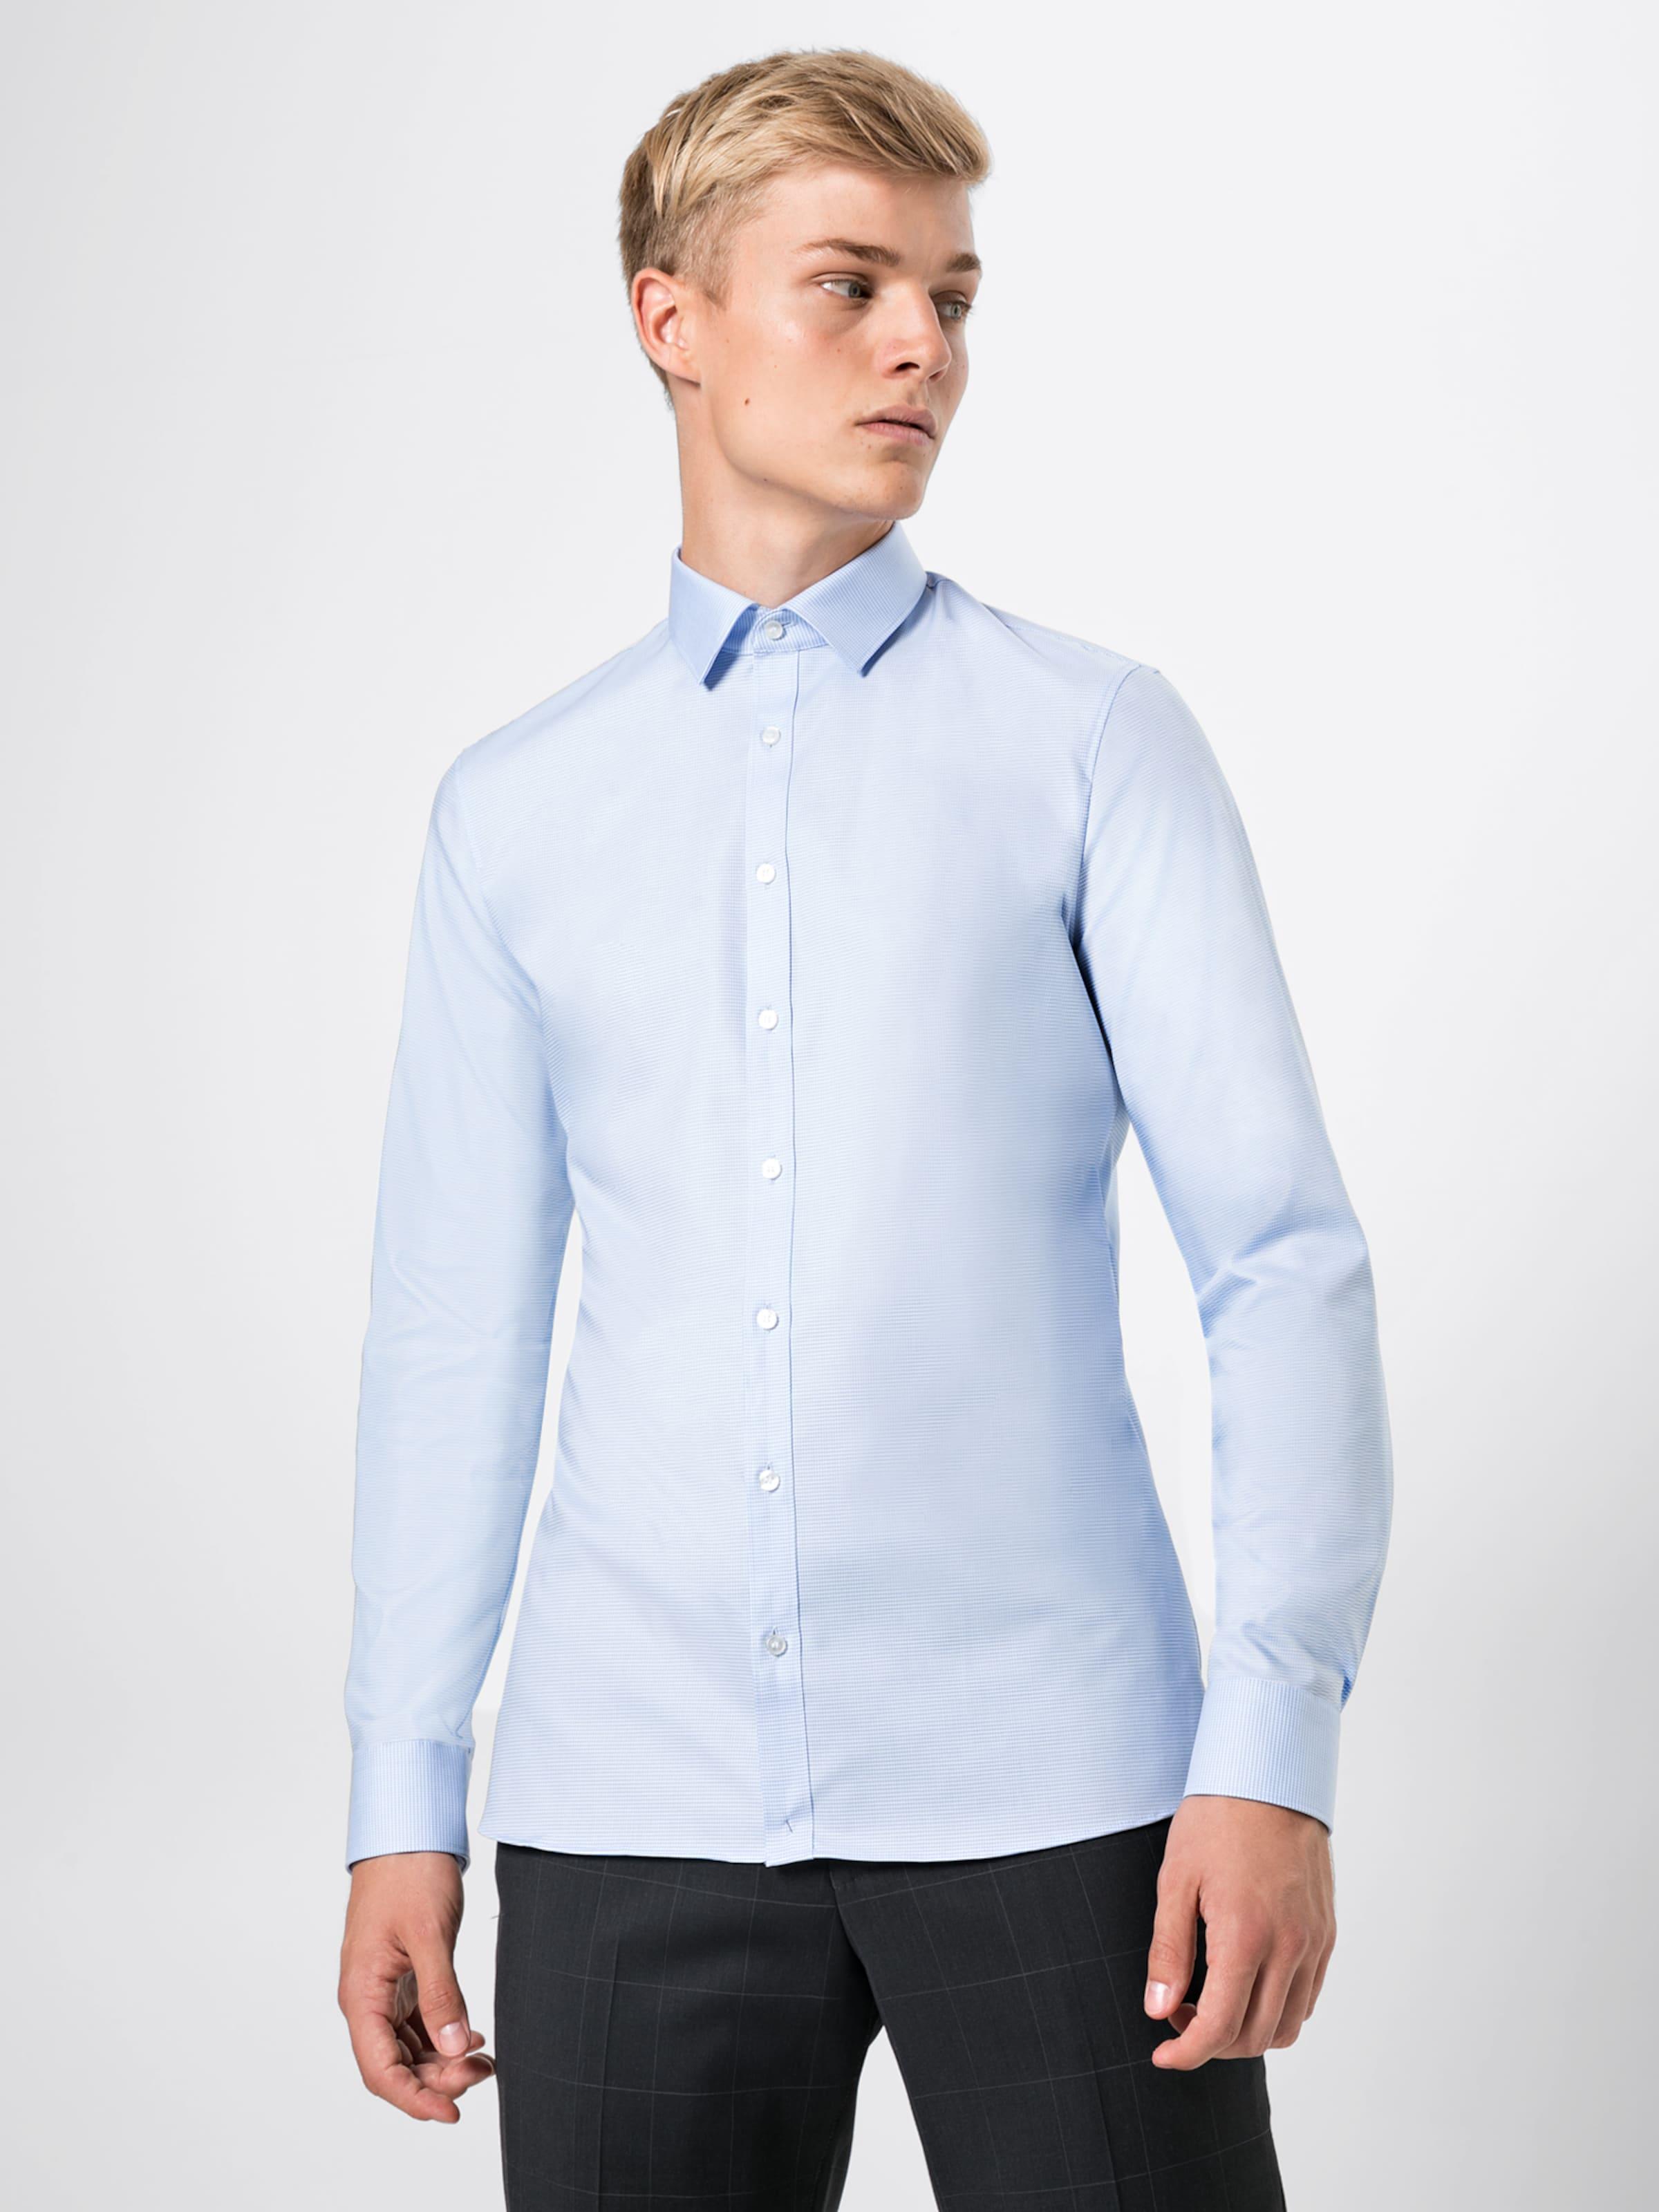 Uni' Faux BlauWeiß In Olymp Hemd 'no6 8k0wOnP